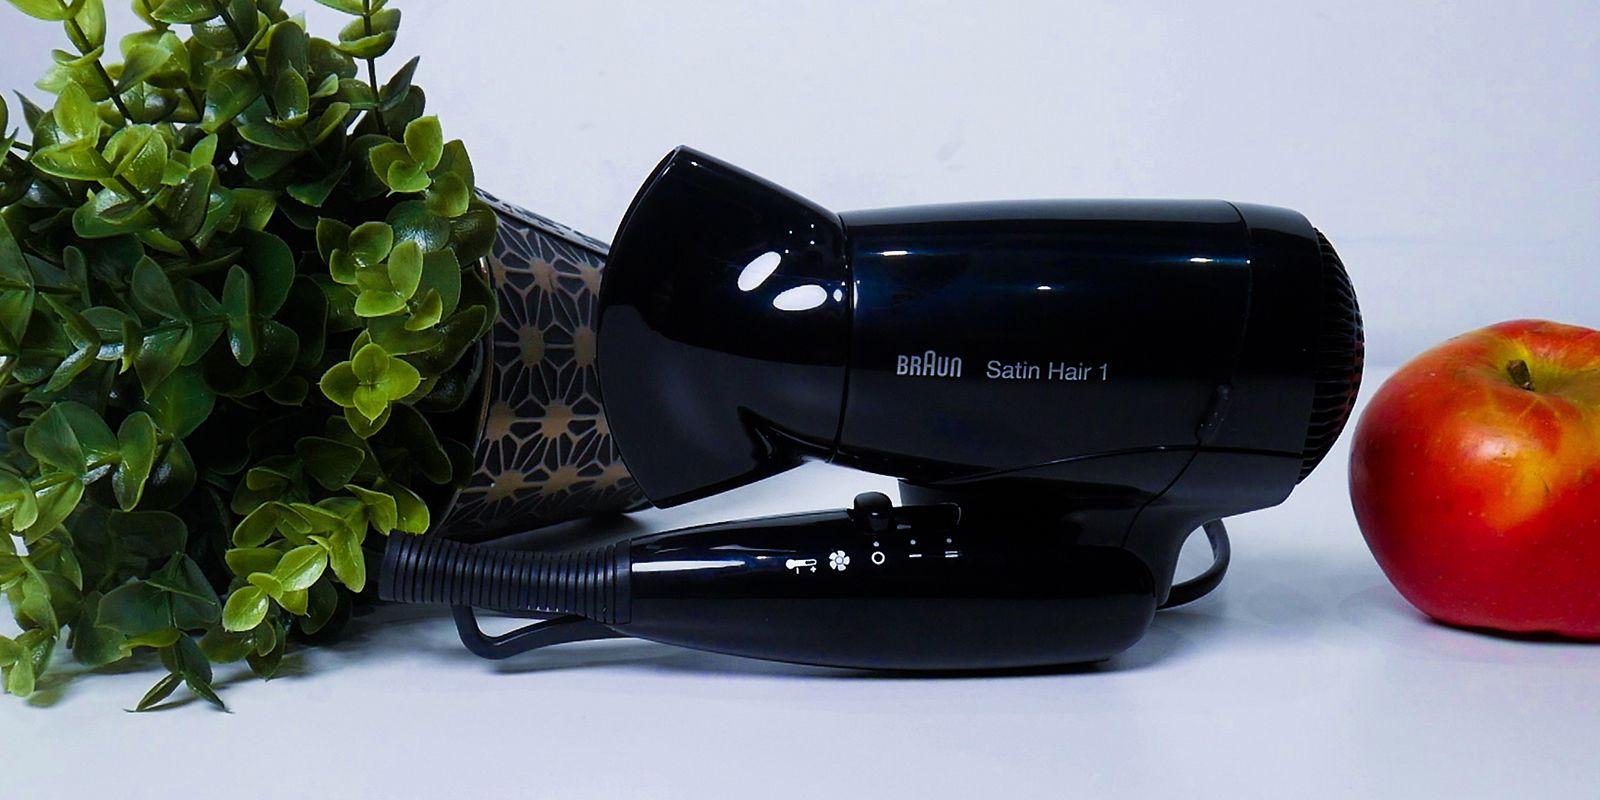 Braun Satin Hair 1 HD 130 Style & Go